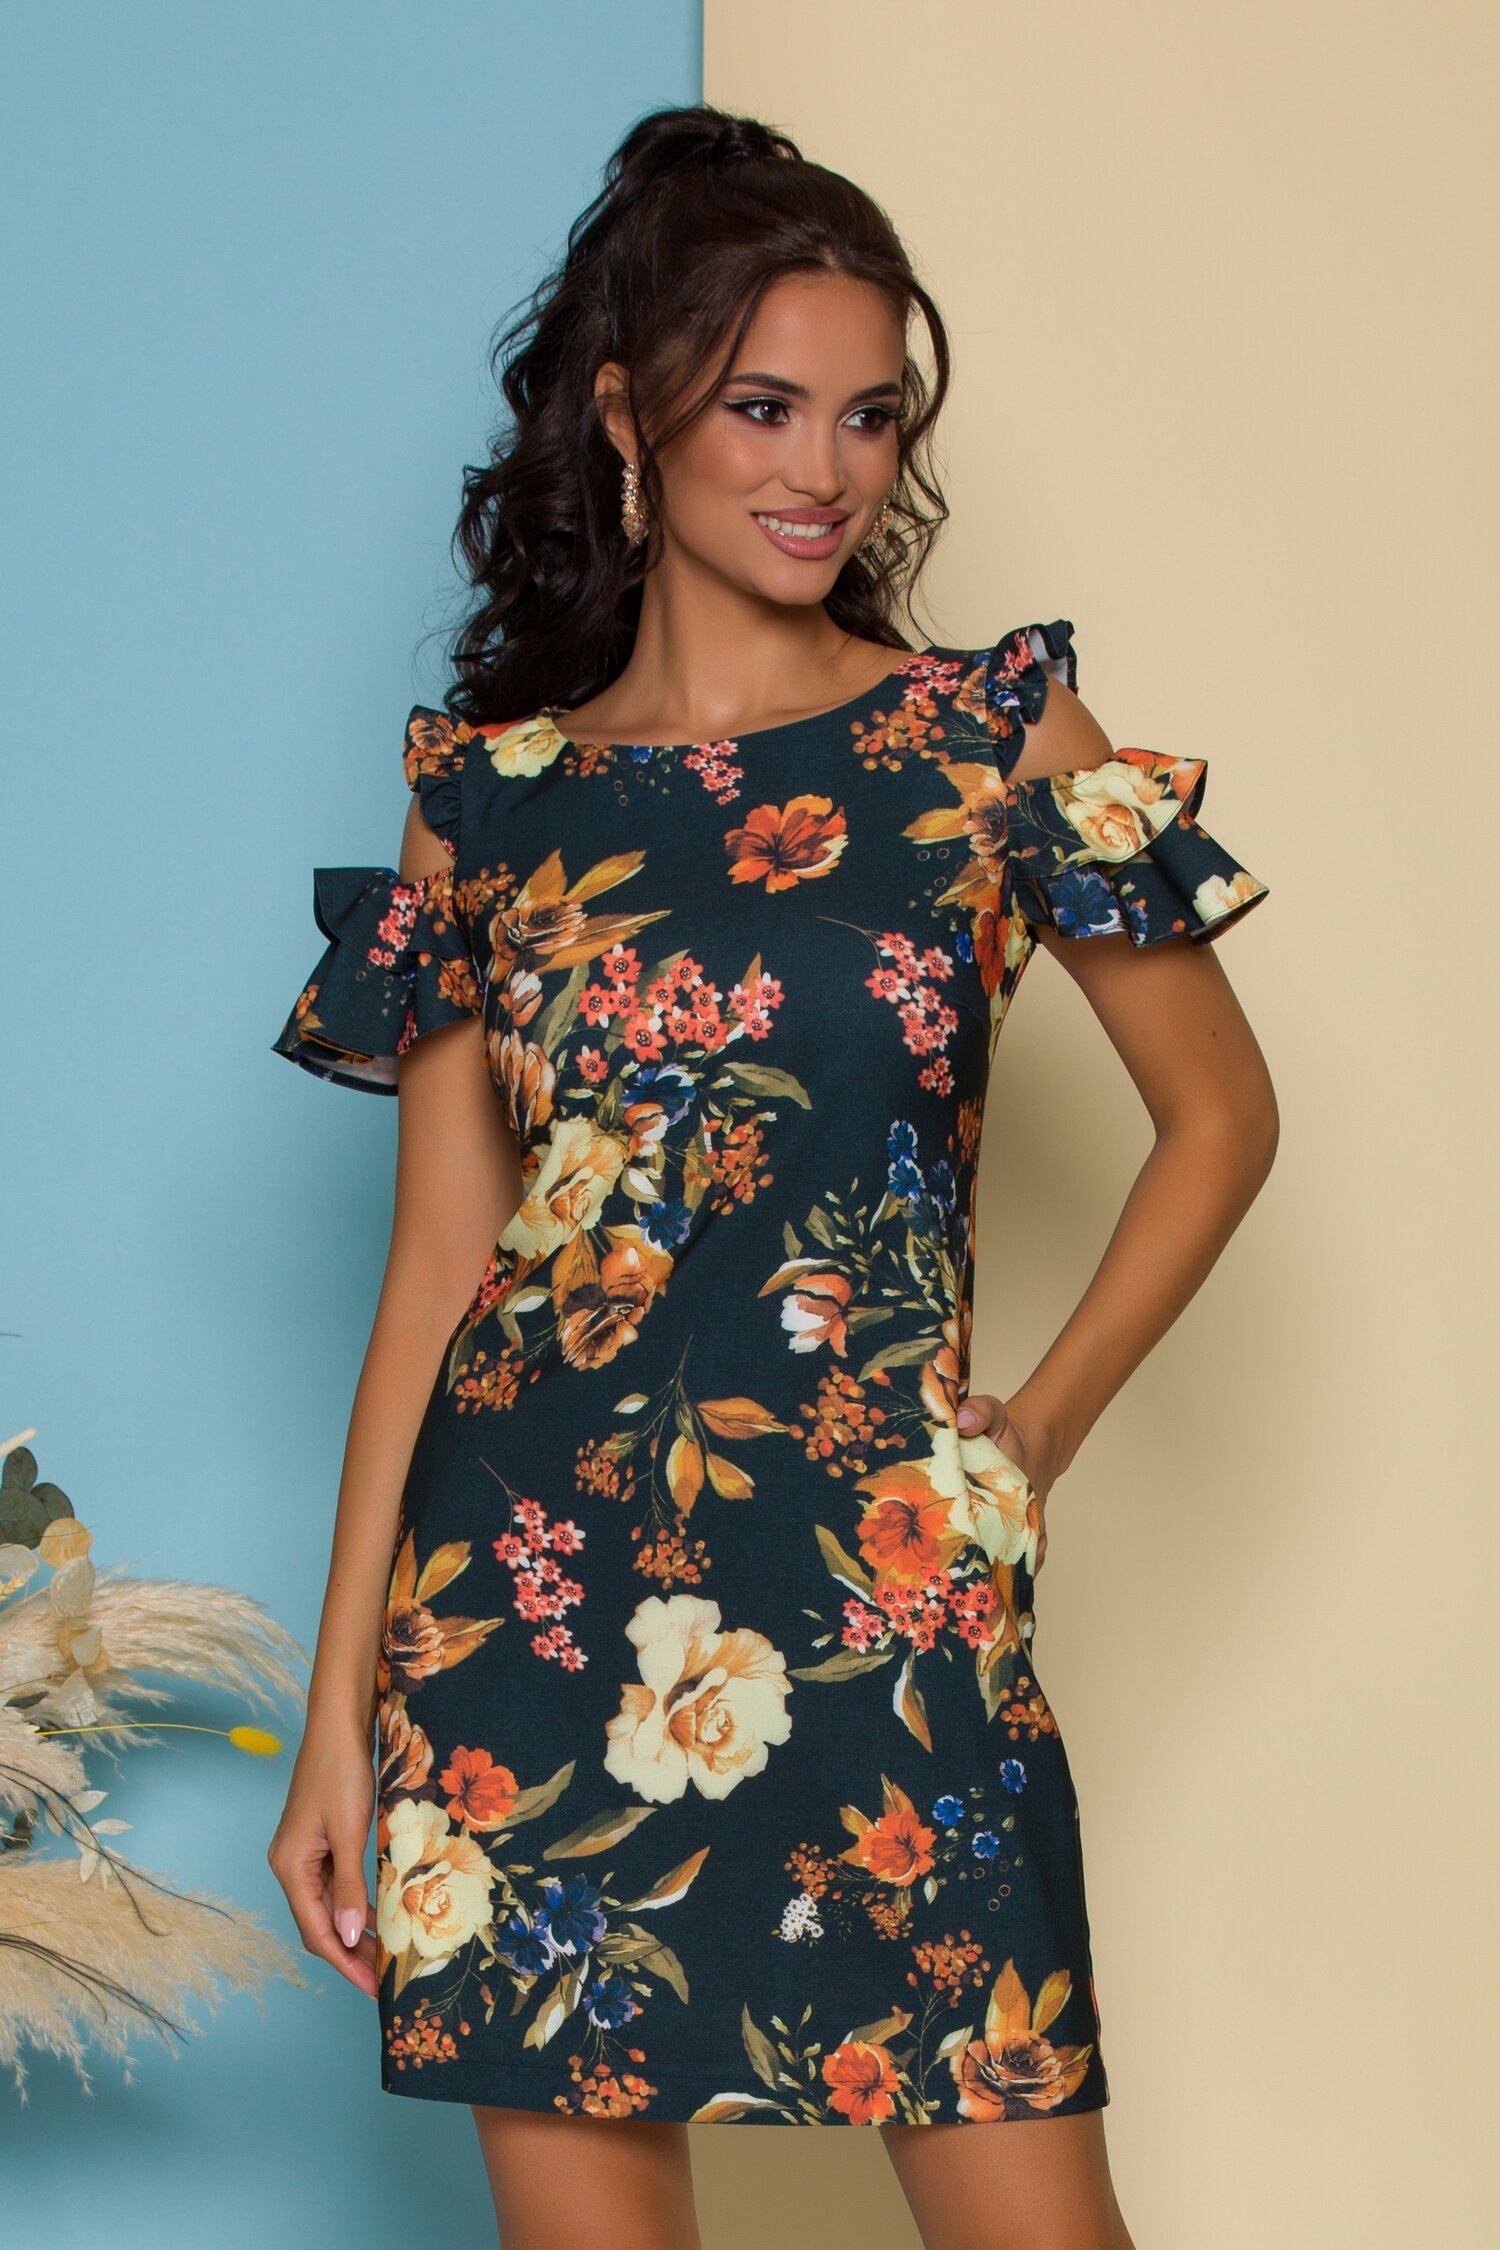 Rochie LaDonna neagra cu imprimeu floral si buzunare functionale